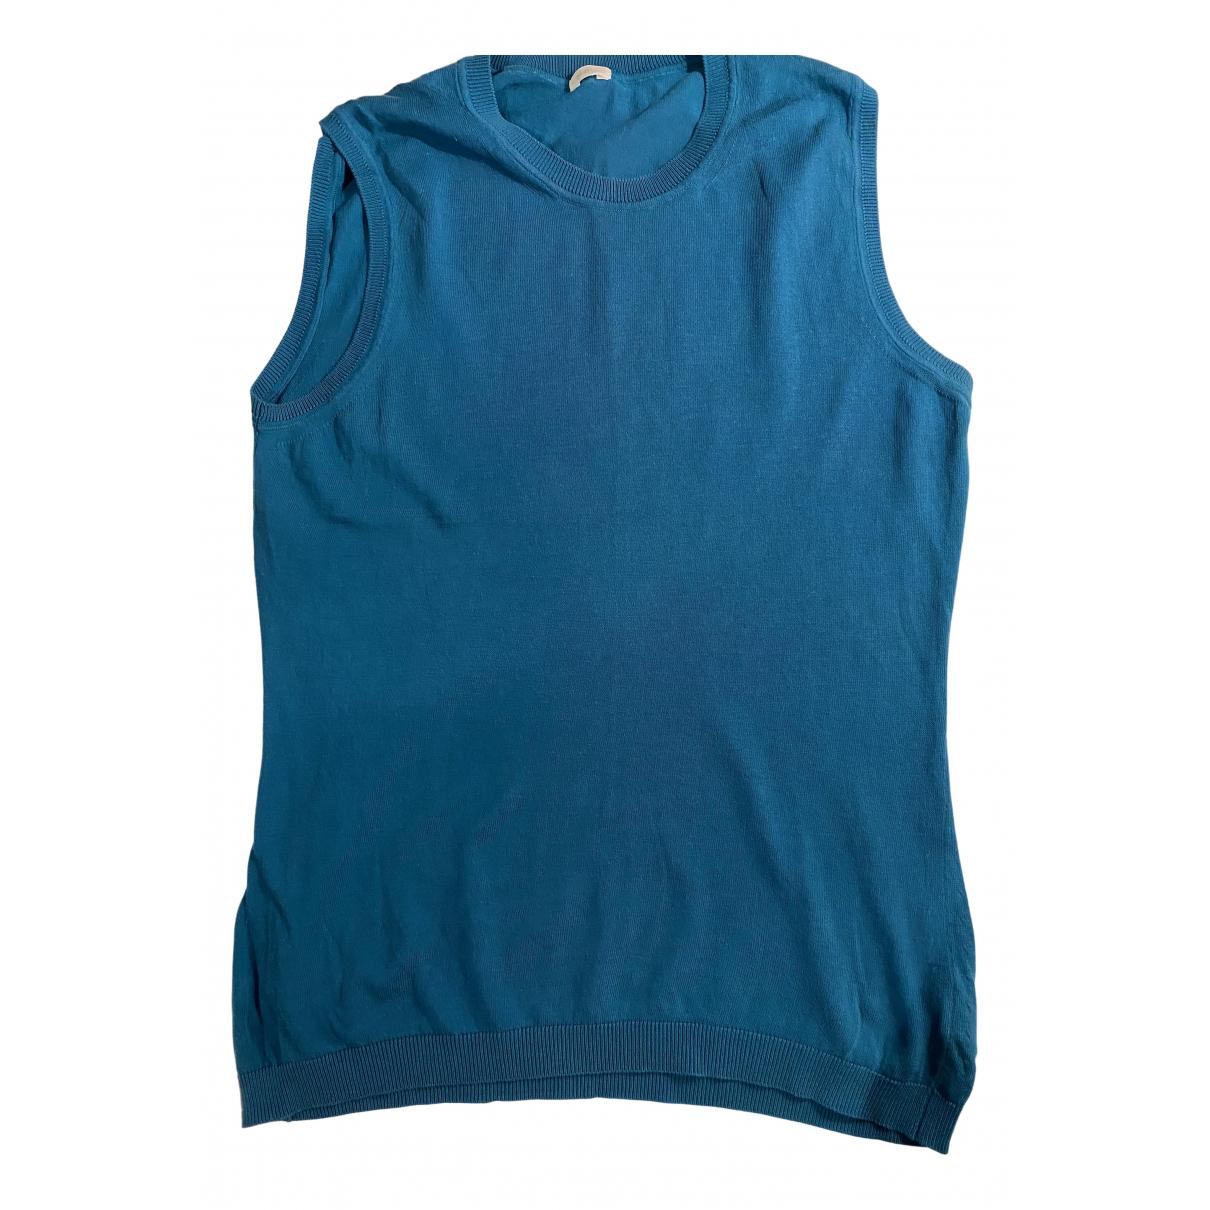 Malo - Top   pour femme en coton - bleu